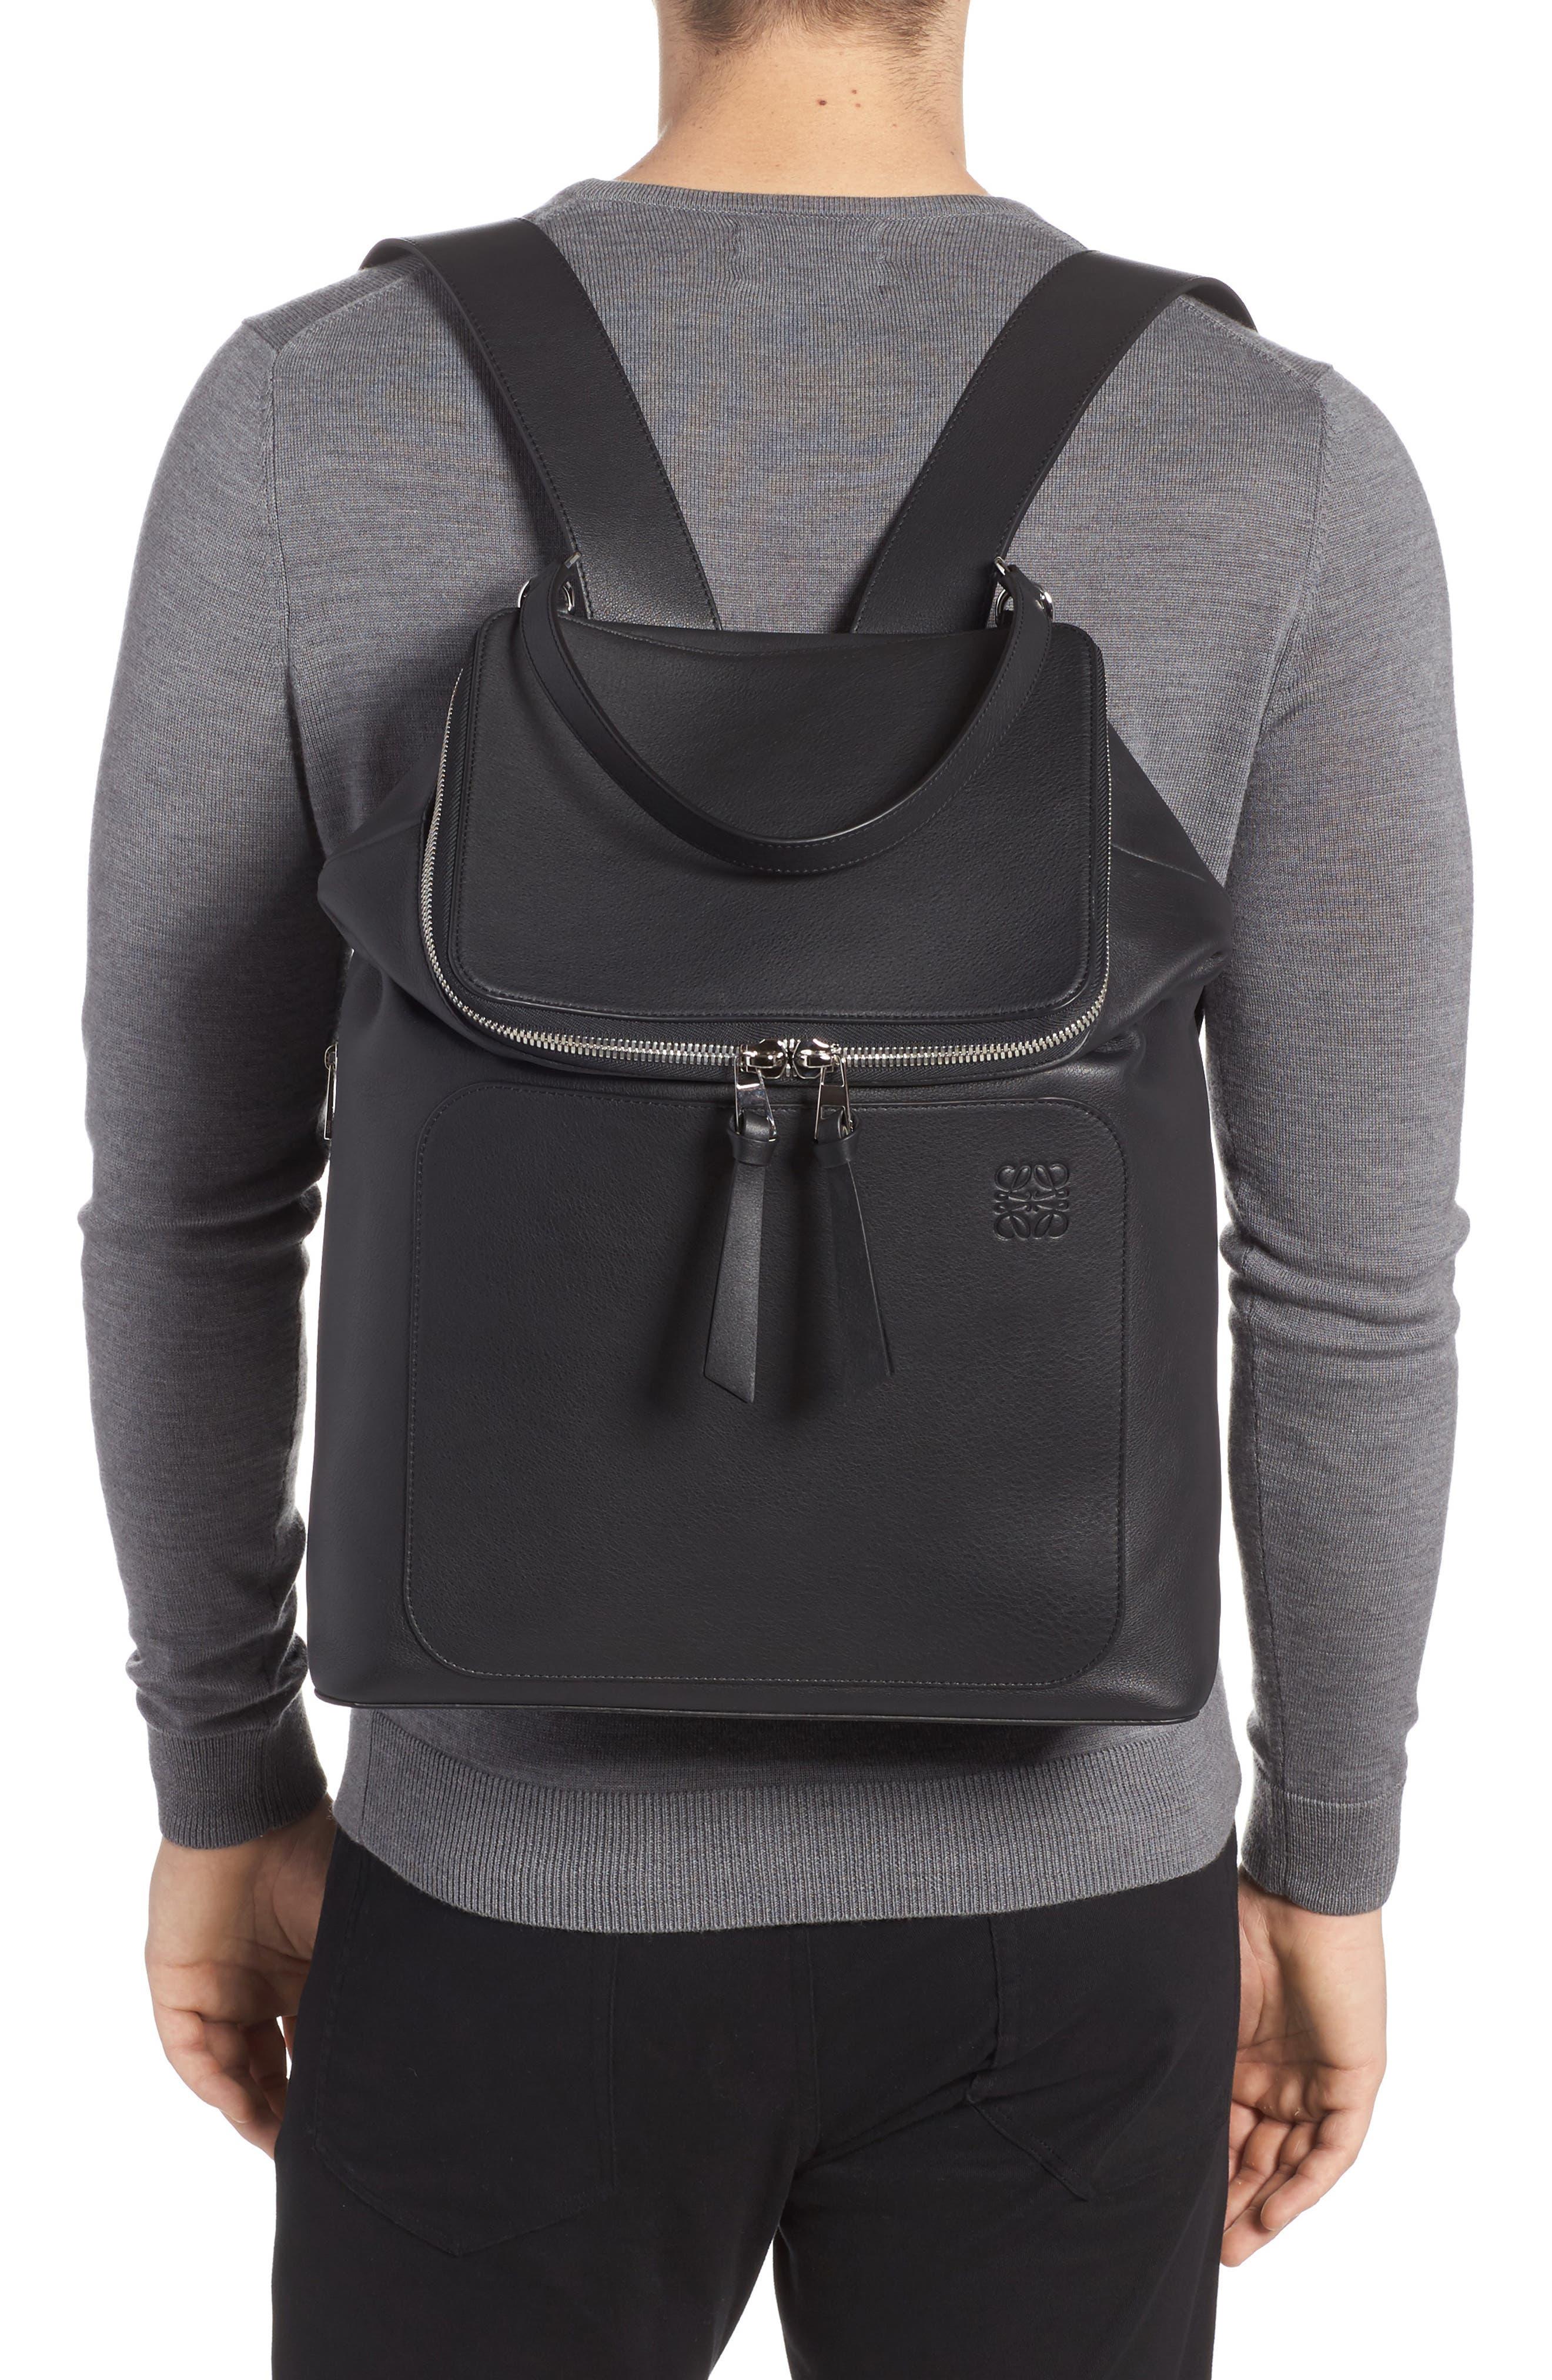 Goya Leather Backpack,                             Alternate thumbnail 2, color,                             BLACK